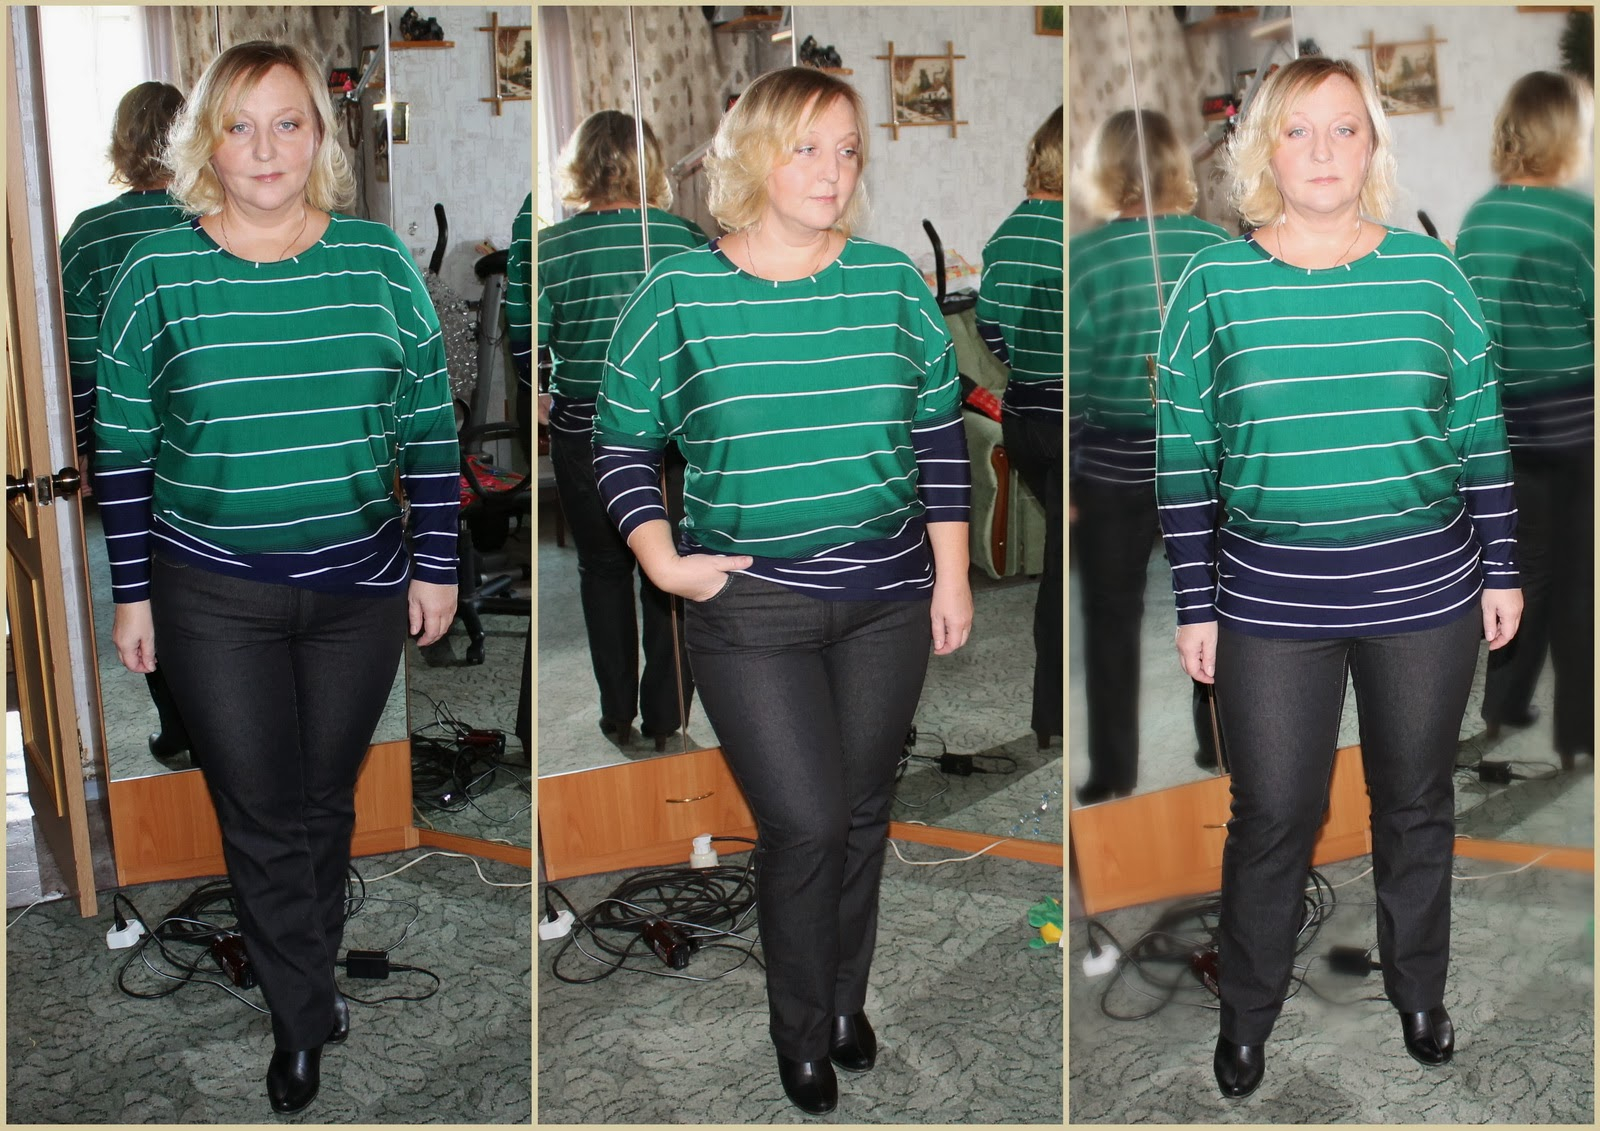 Титькки 5 размера фото 14 фотография